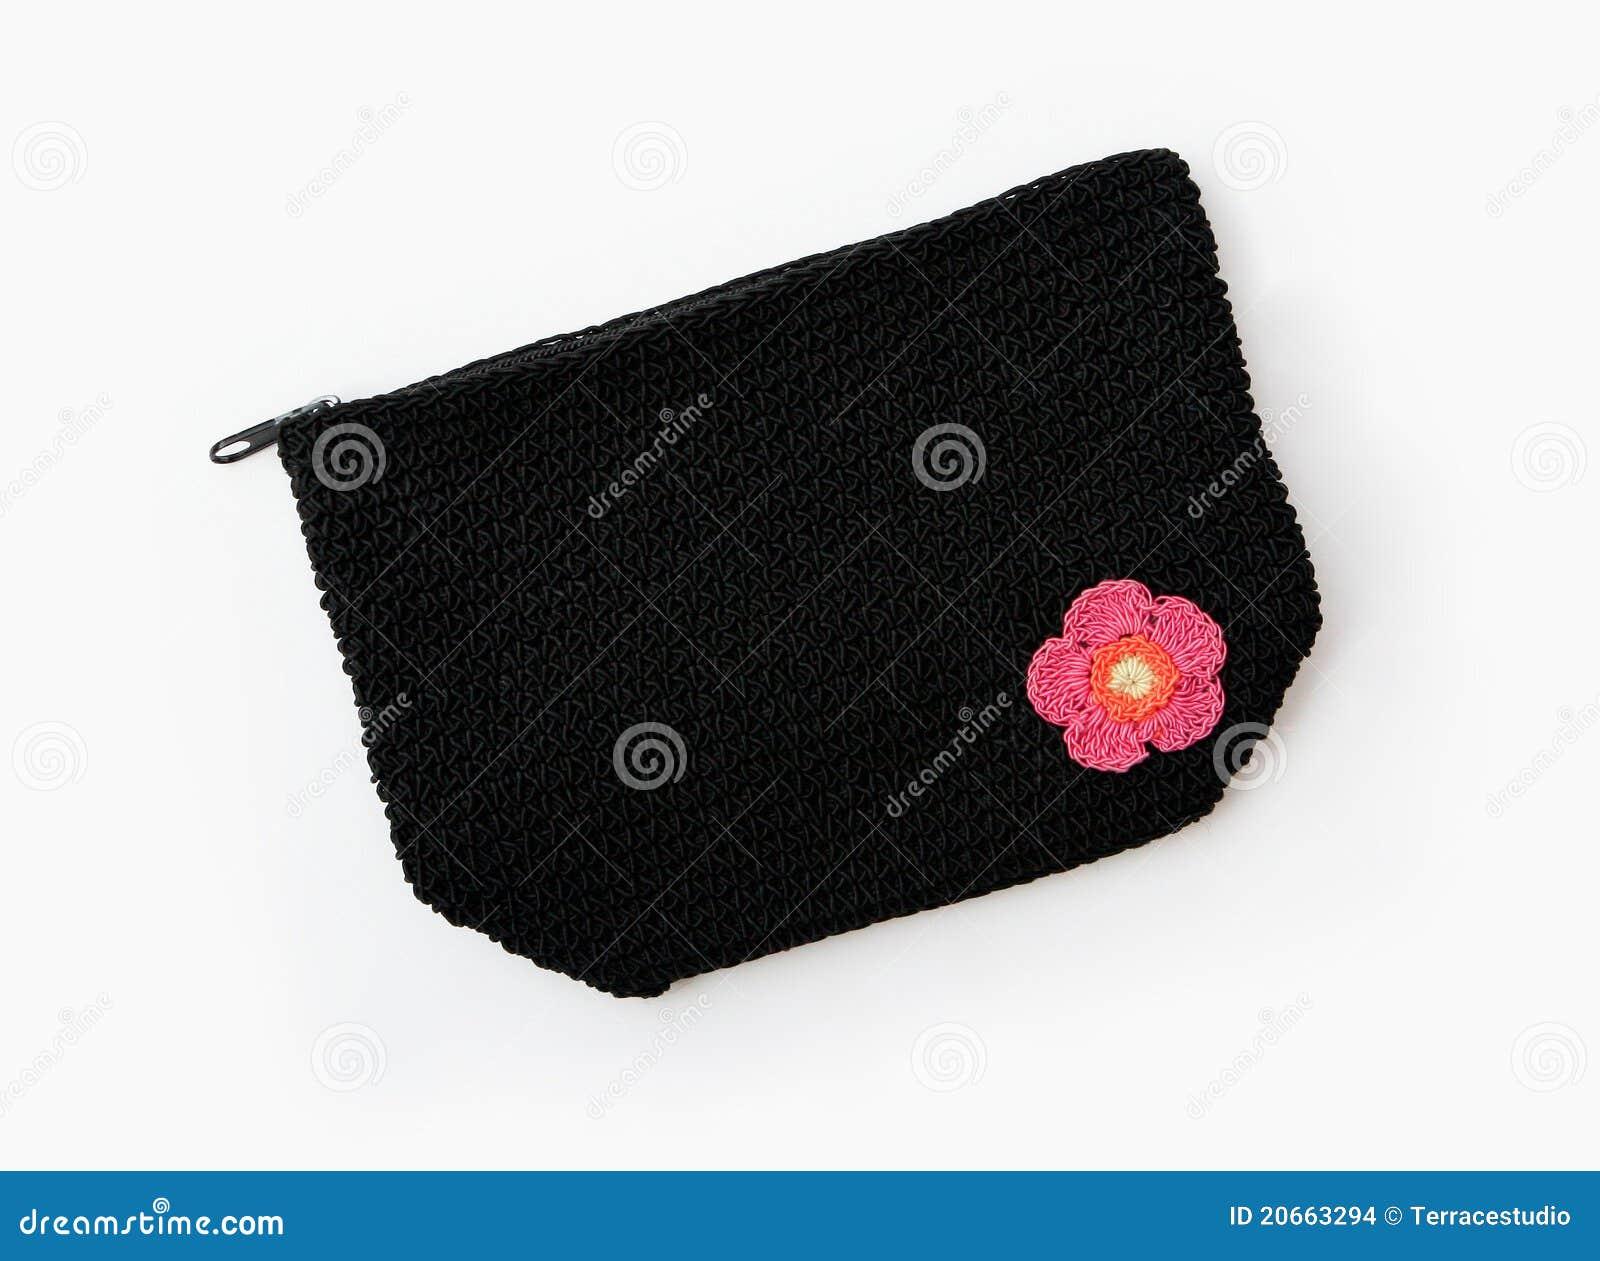 Knitting Pattern Makeup Bag : Black Knit Makeup Or Accessory Bag Stock Images - Image: 20663294